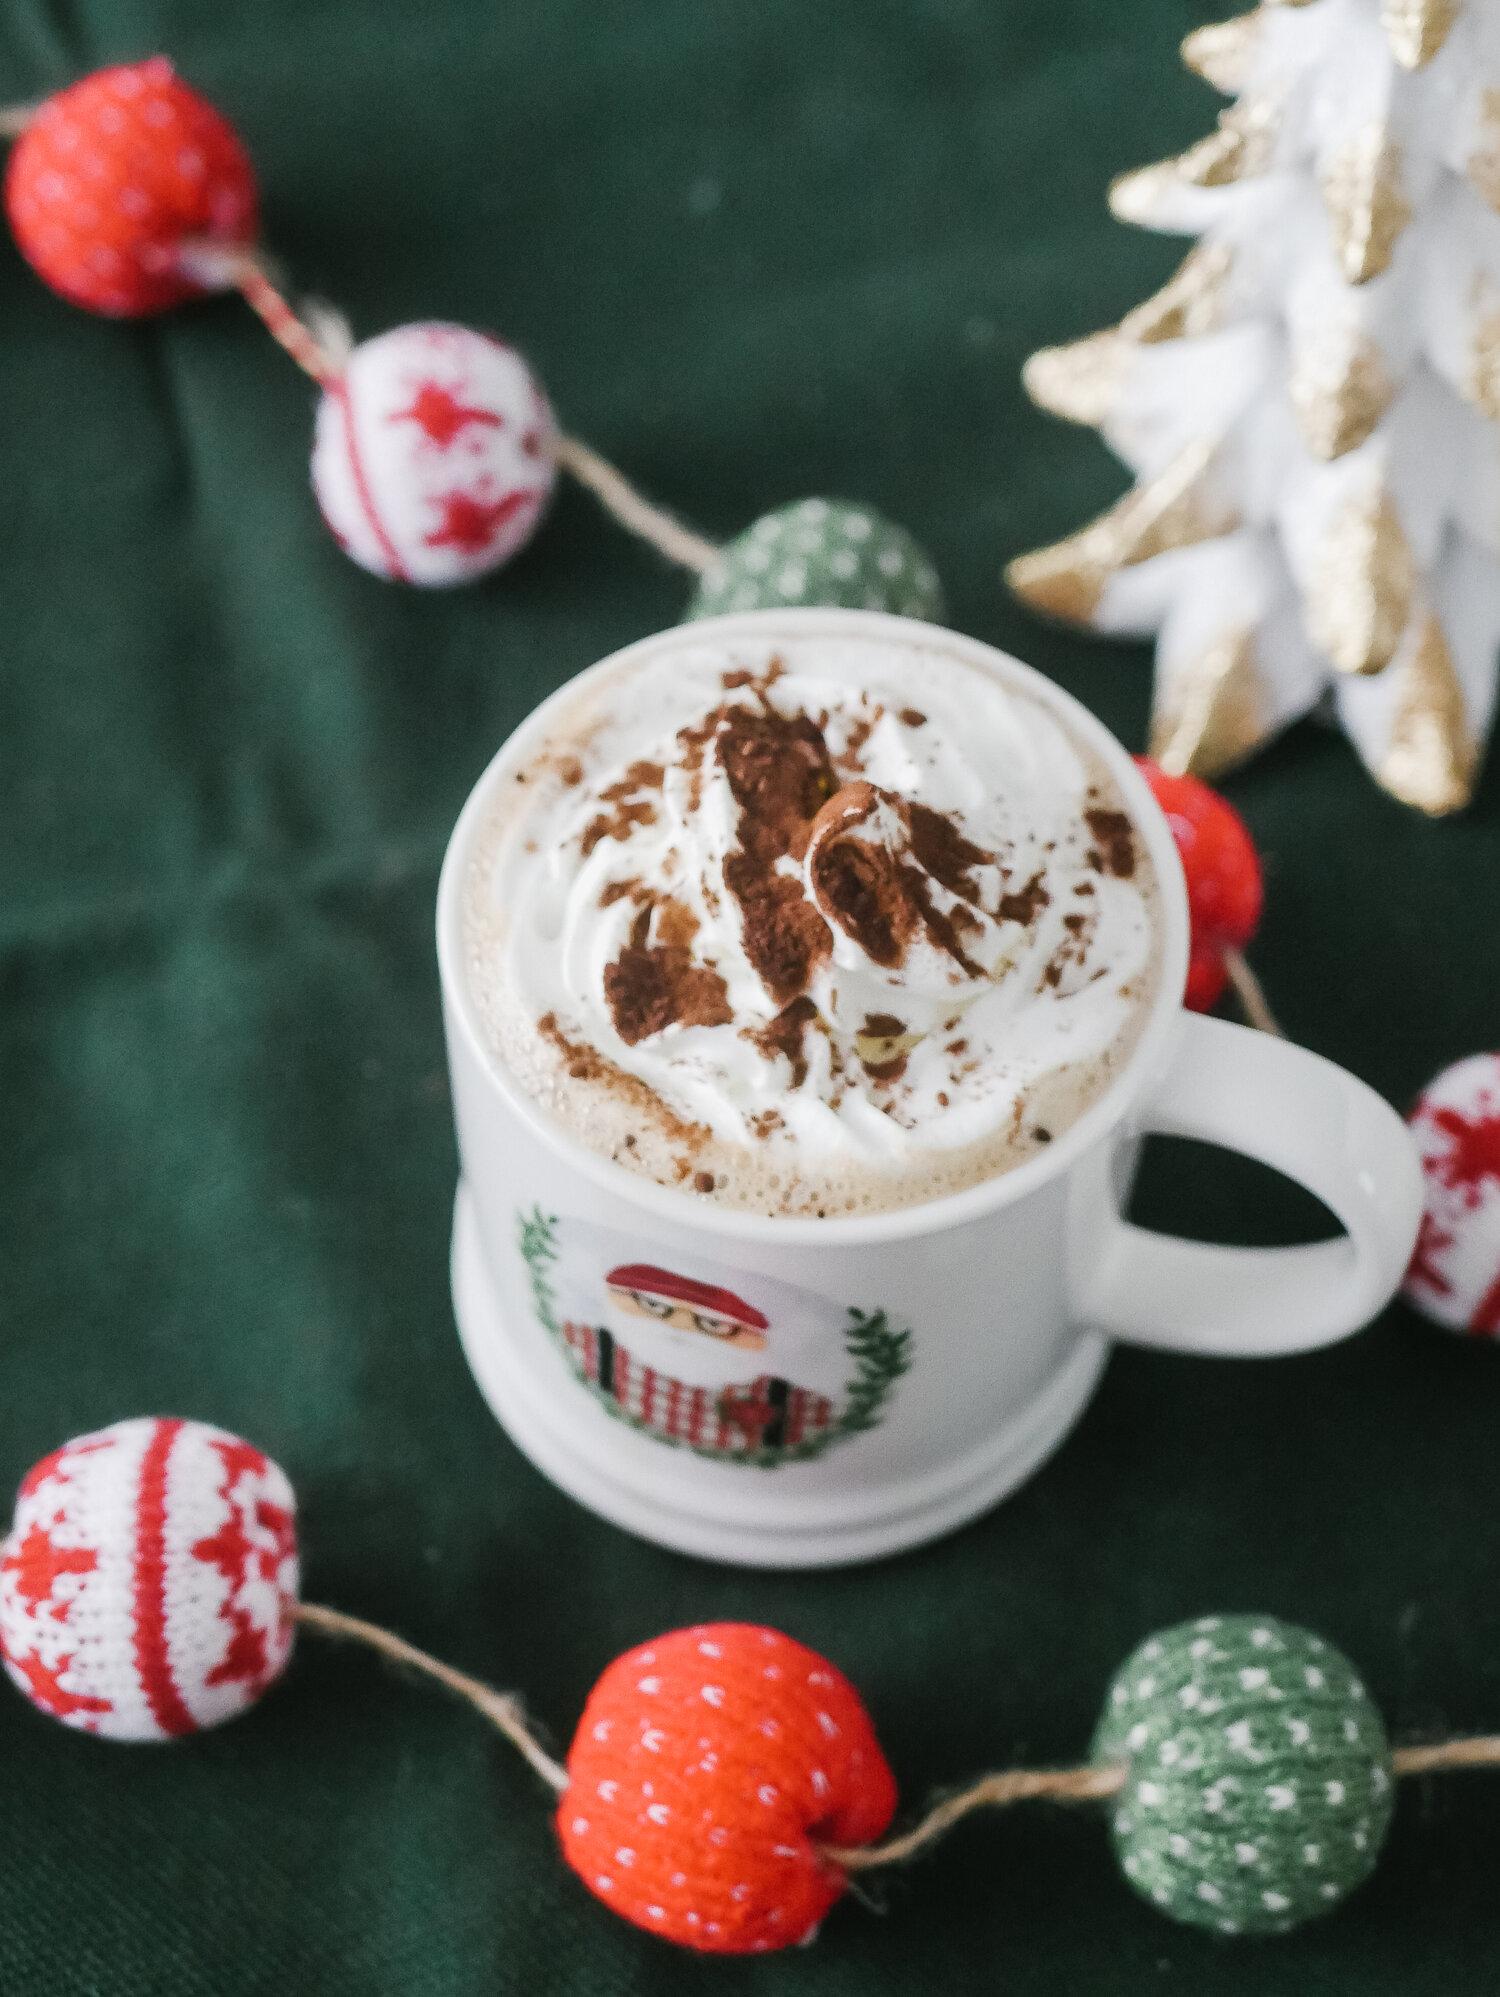 10 hot chocolate vials